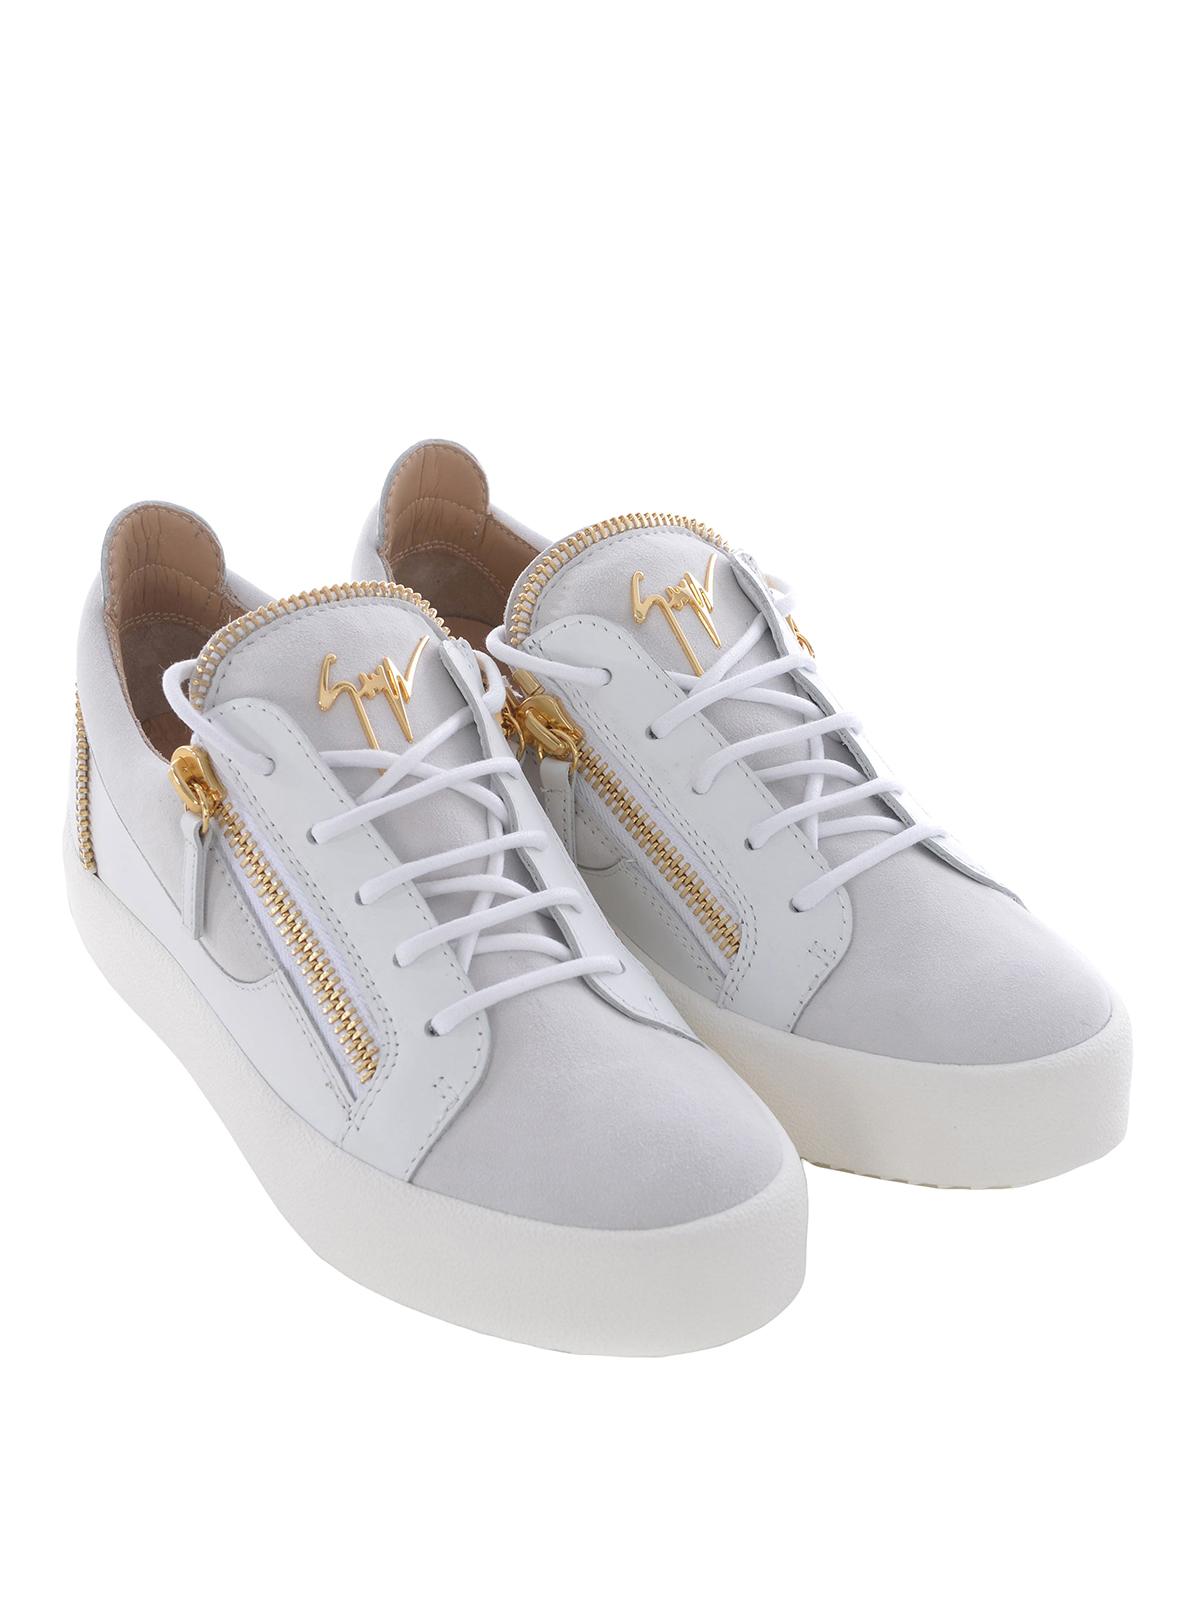 90c5fda3d297b Giuseppe Zanotti - Kirk Low zip details sneakers - trainers - RM80006001